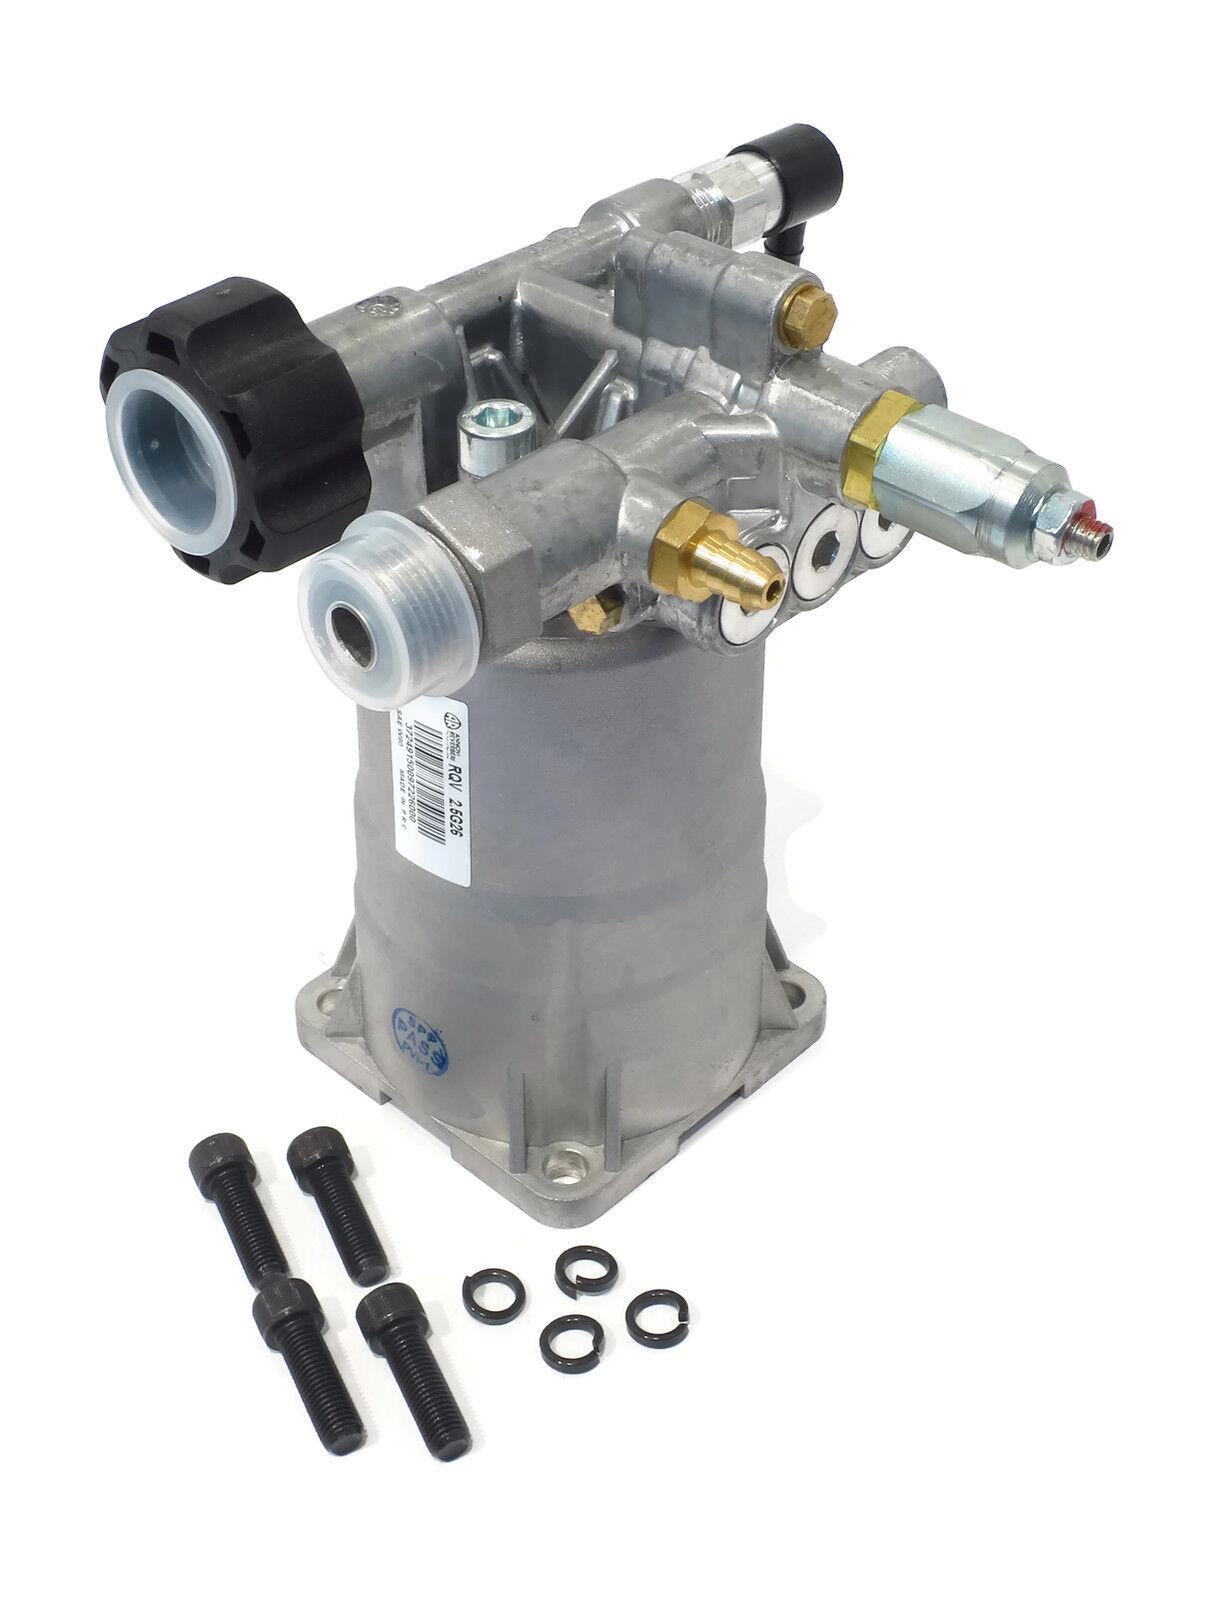 Nuevo 2600 PSI Hidrolimpiadora Bomba De Agua Coleman PowerMate PW0912400 & .01 .02